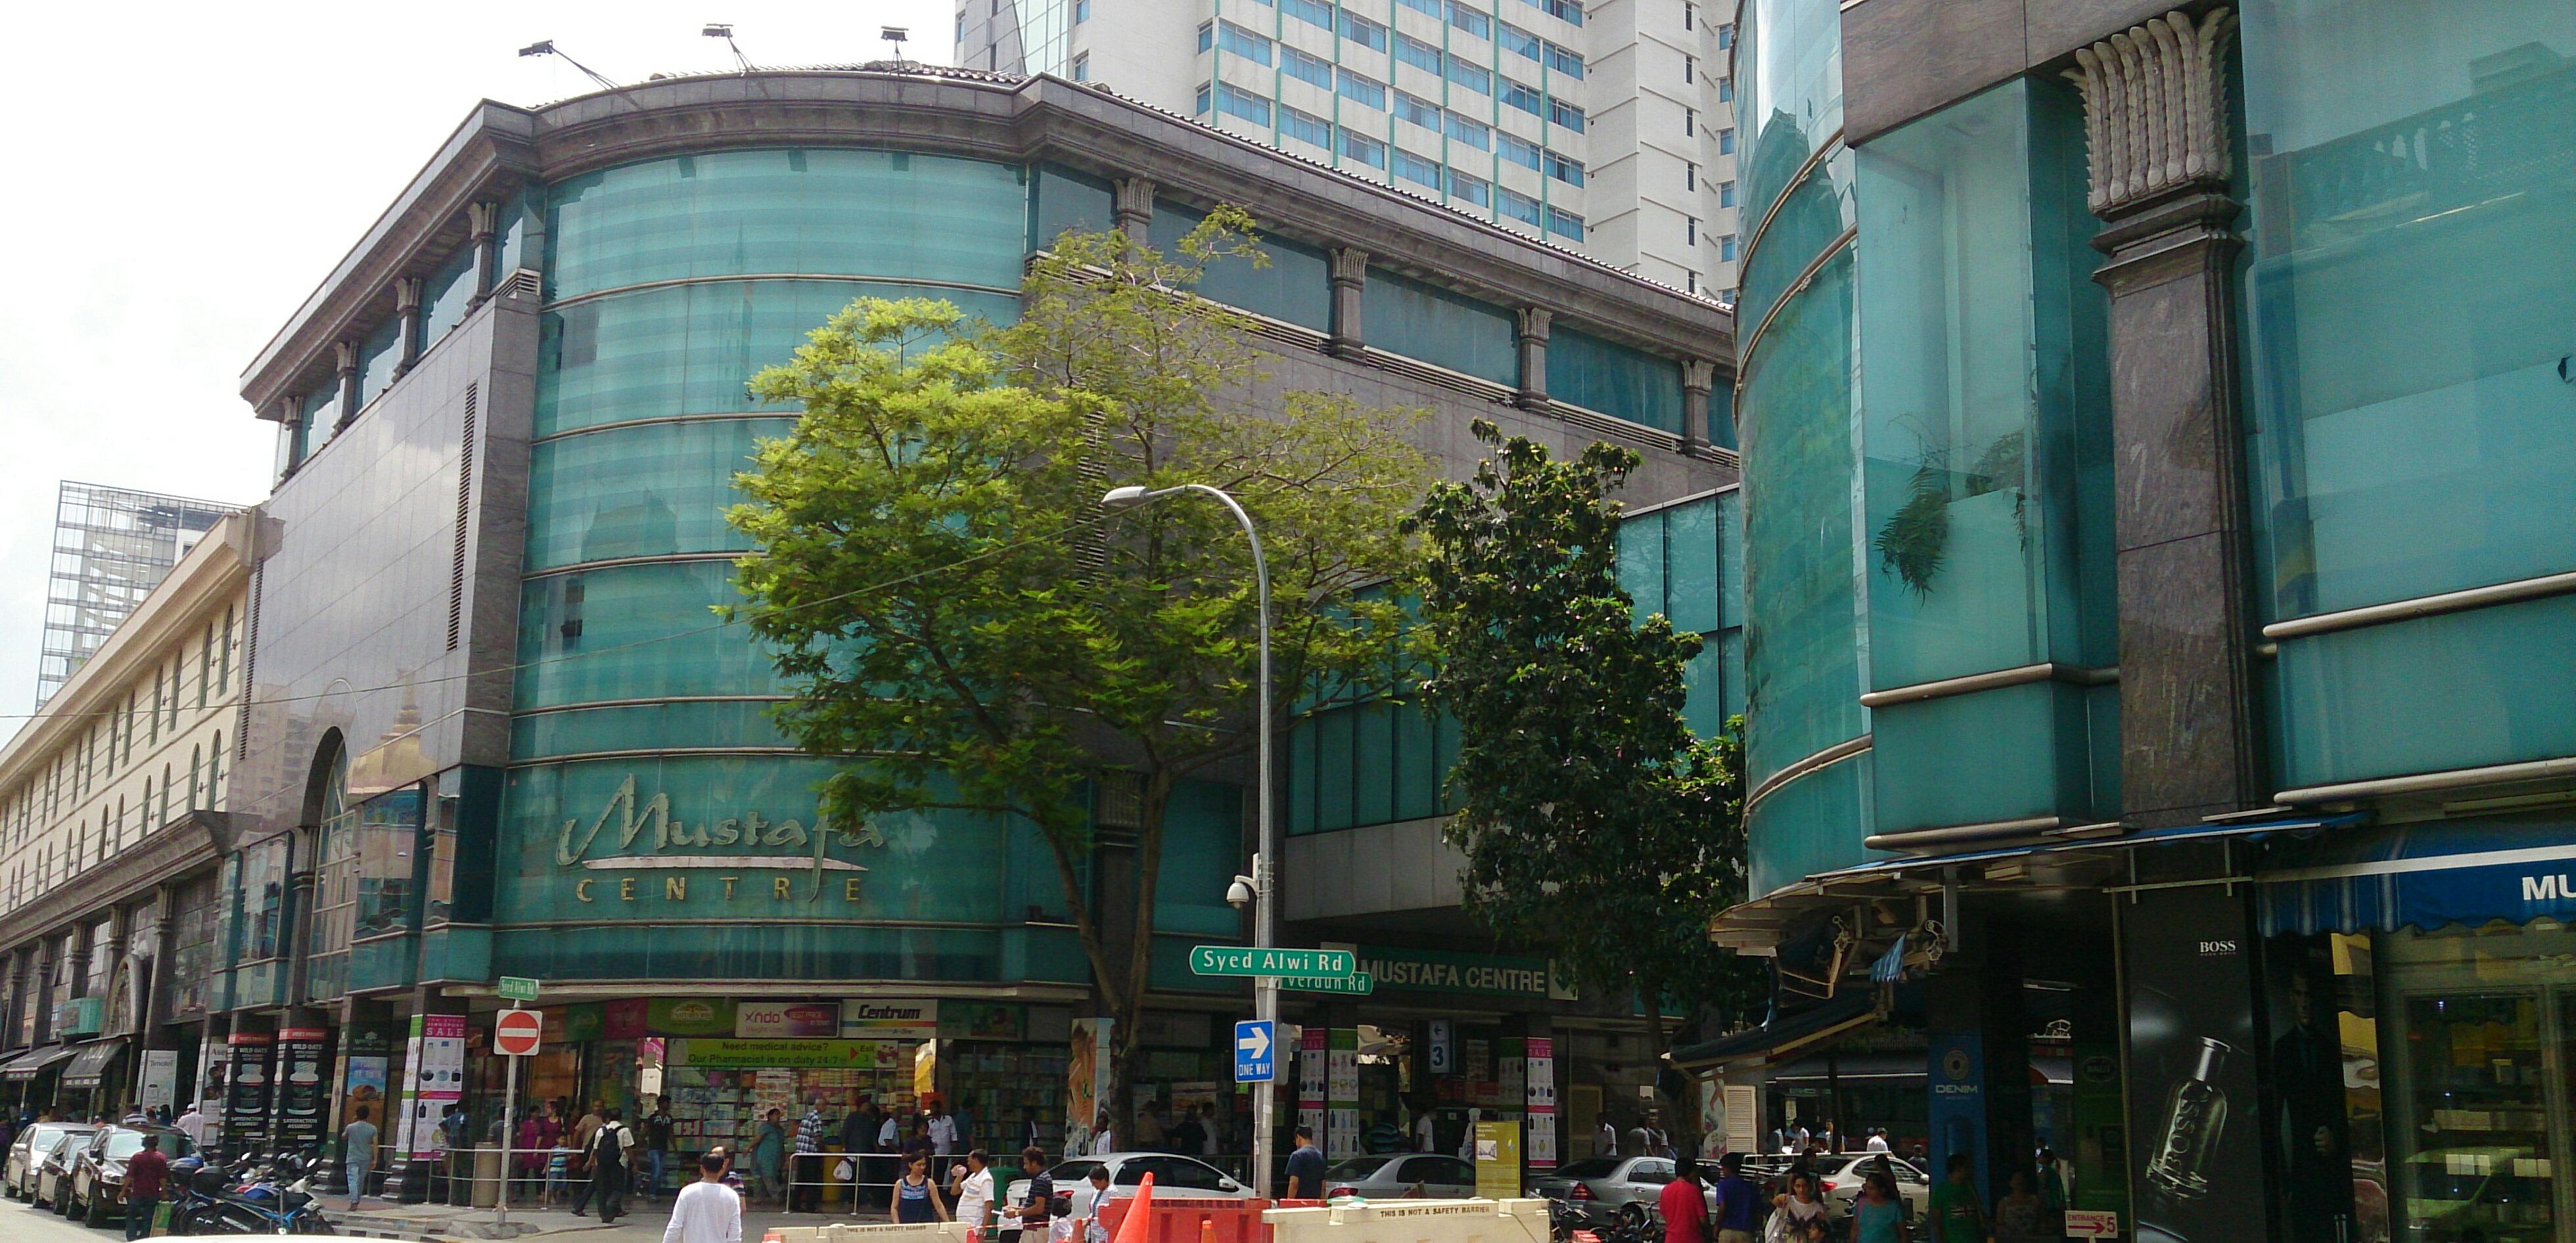 Mustafa Centre. Photo courtesy: Wikimedia/ProjectManhattan